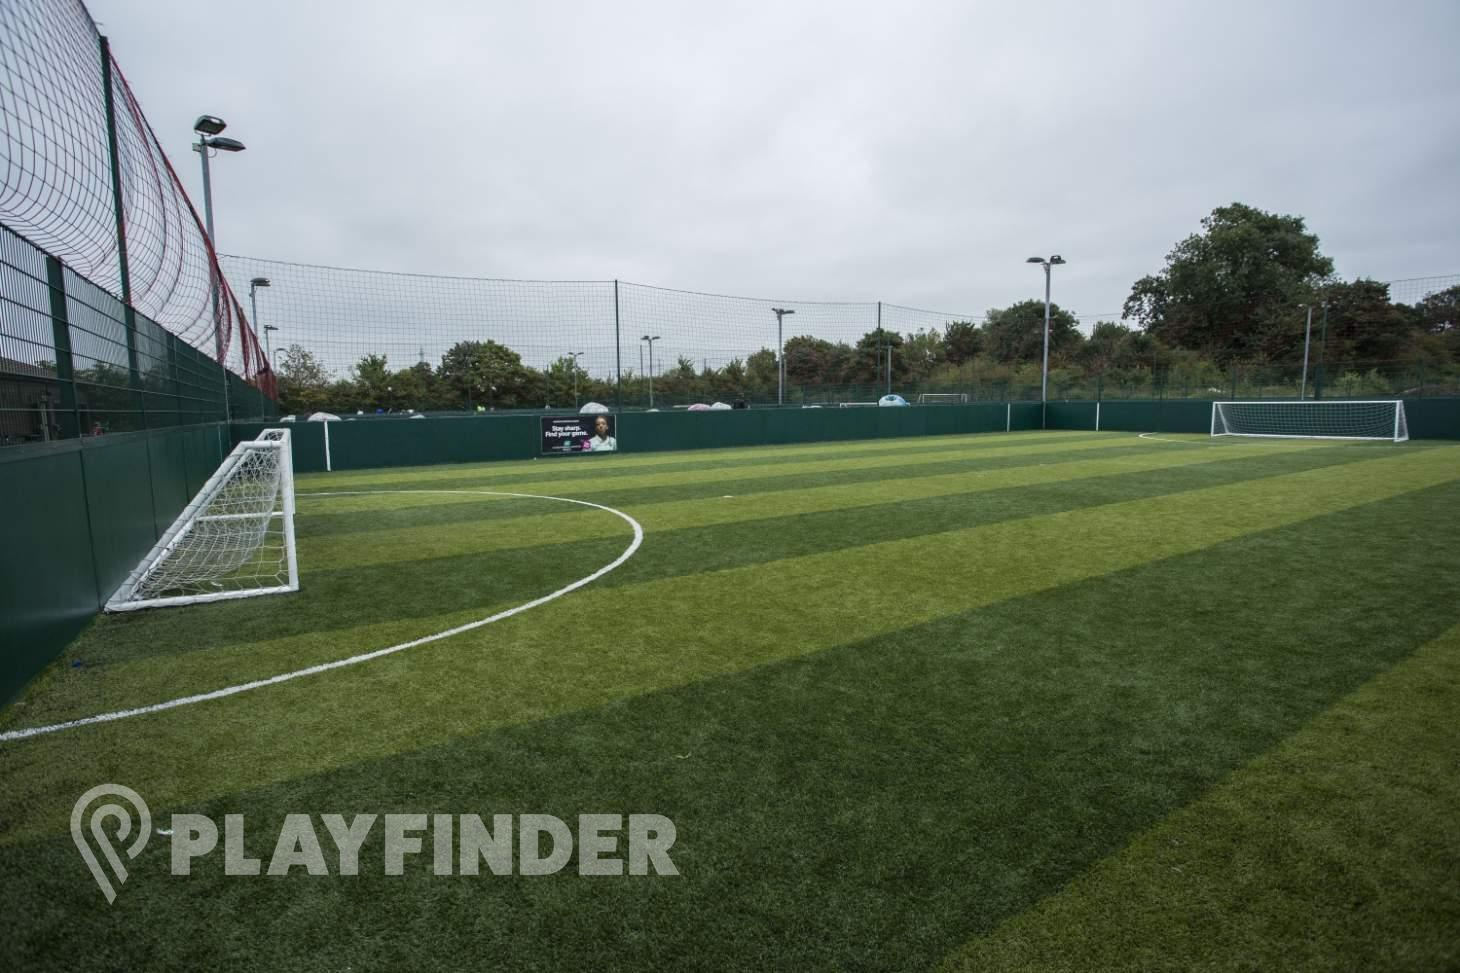 Powerleague Watford 5 a side | 3G Astroturf football pitch